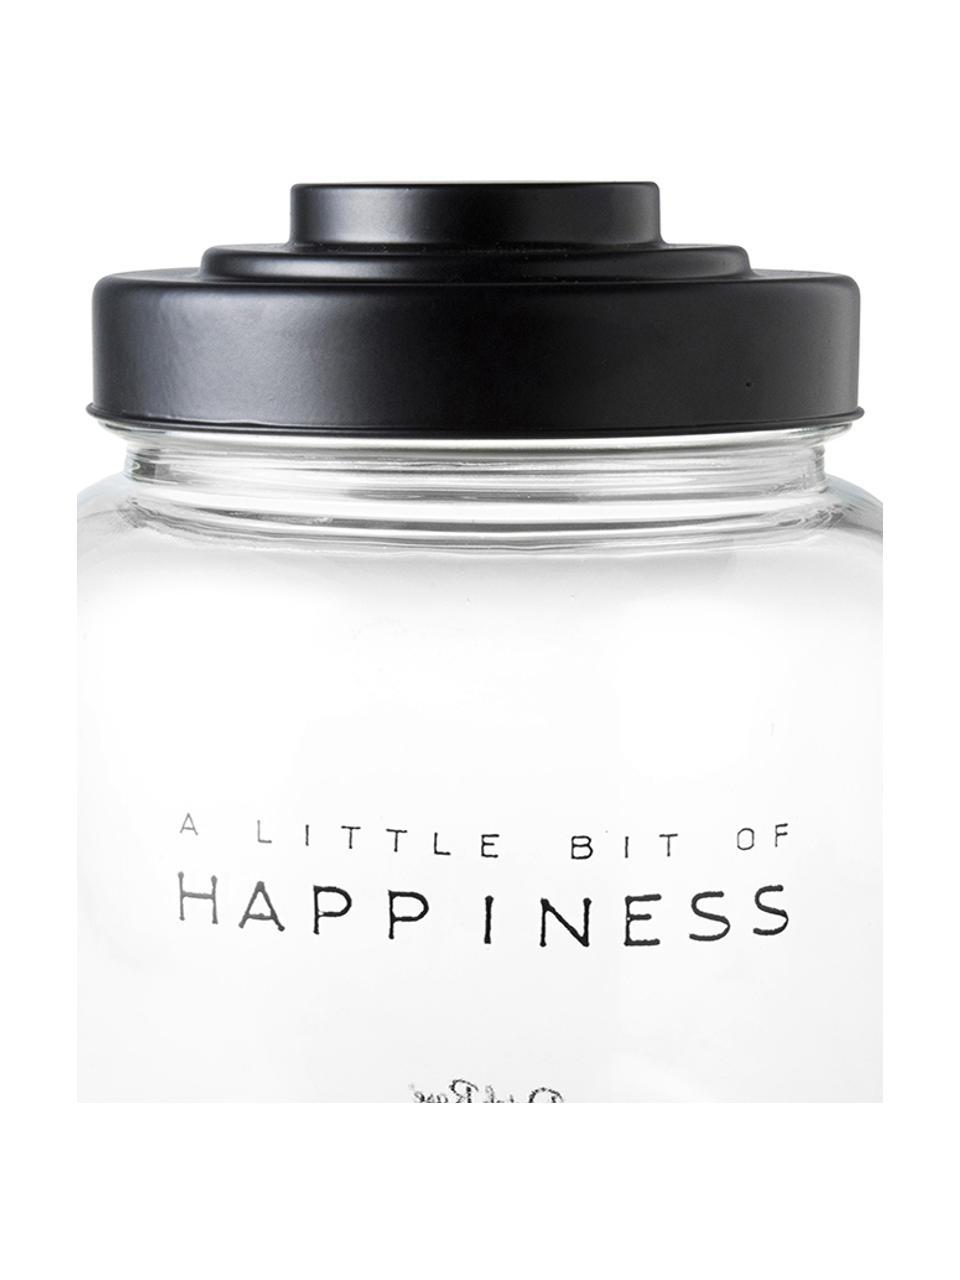 Aufbewahrungsglas Happiness, Ø 16 x H 21 cm, Deckel: Porzellan, lackiert, Transparent, Ø 16 x H 21 cm